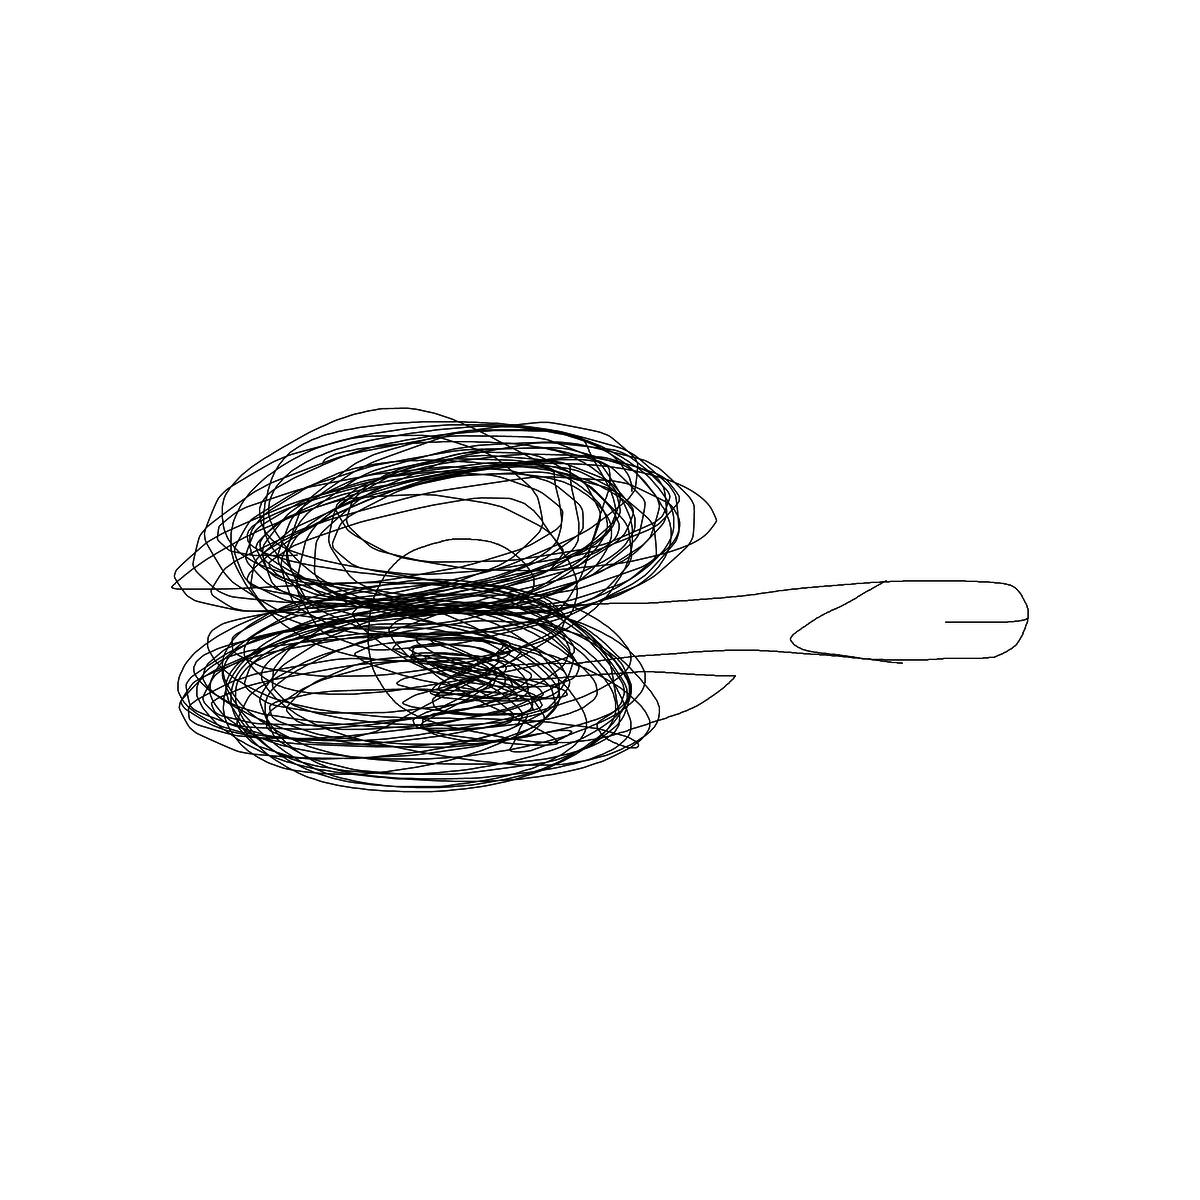 BAAAM drawing#1942 lat:44.6784248352050800lng: -63.4781646728515600